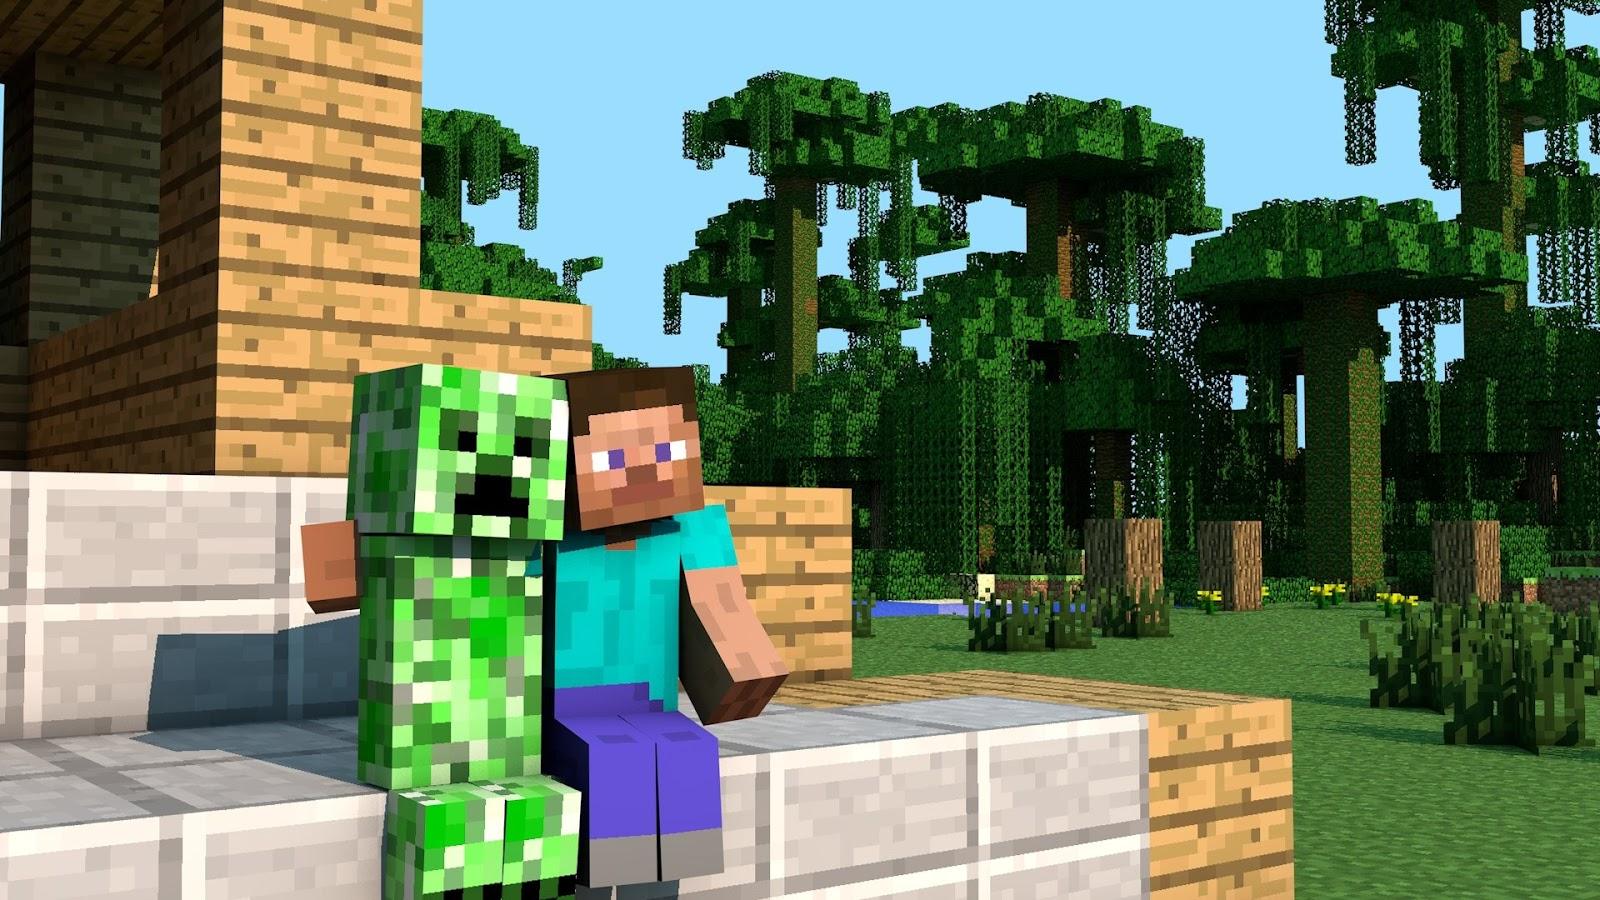 Fondos de minecraft steve y creeper - Minecraft creeper and steve ...